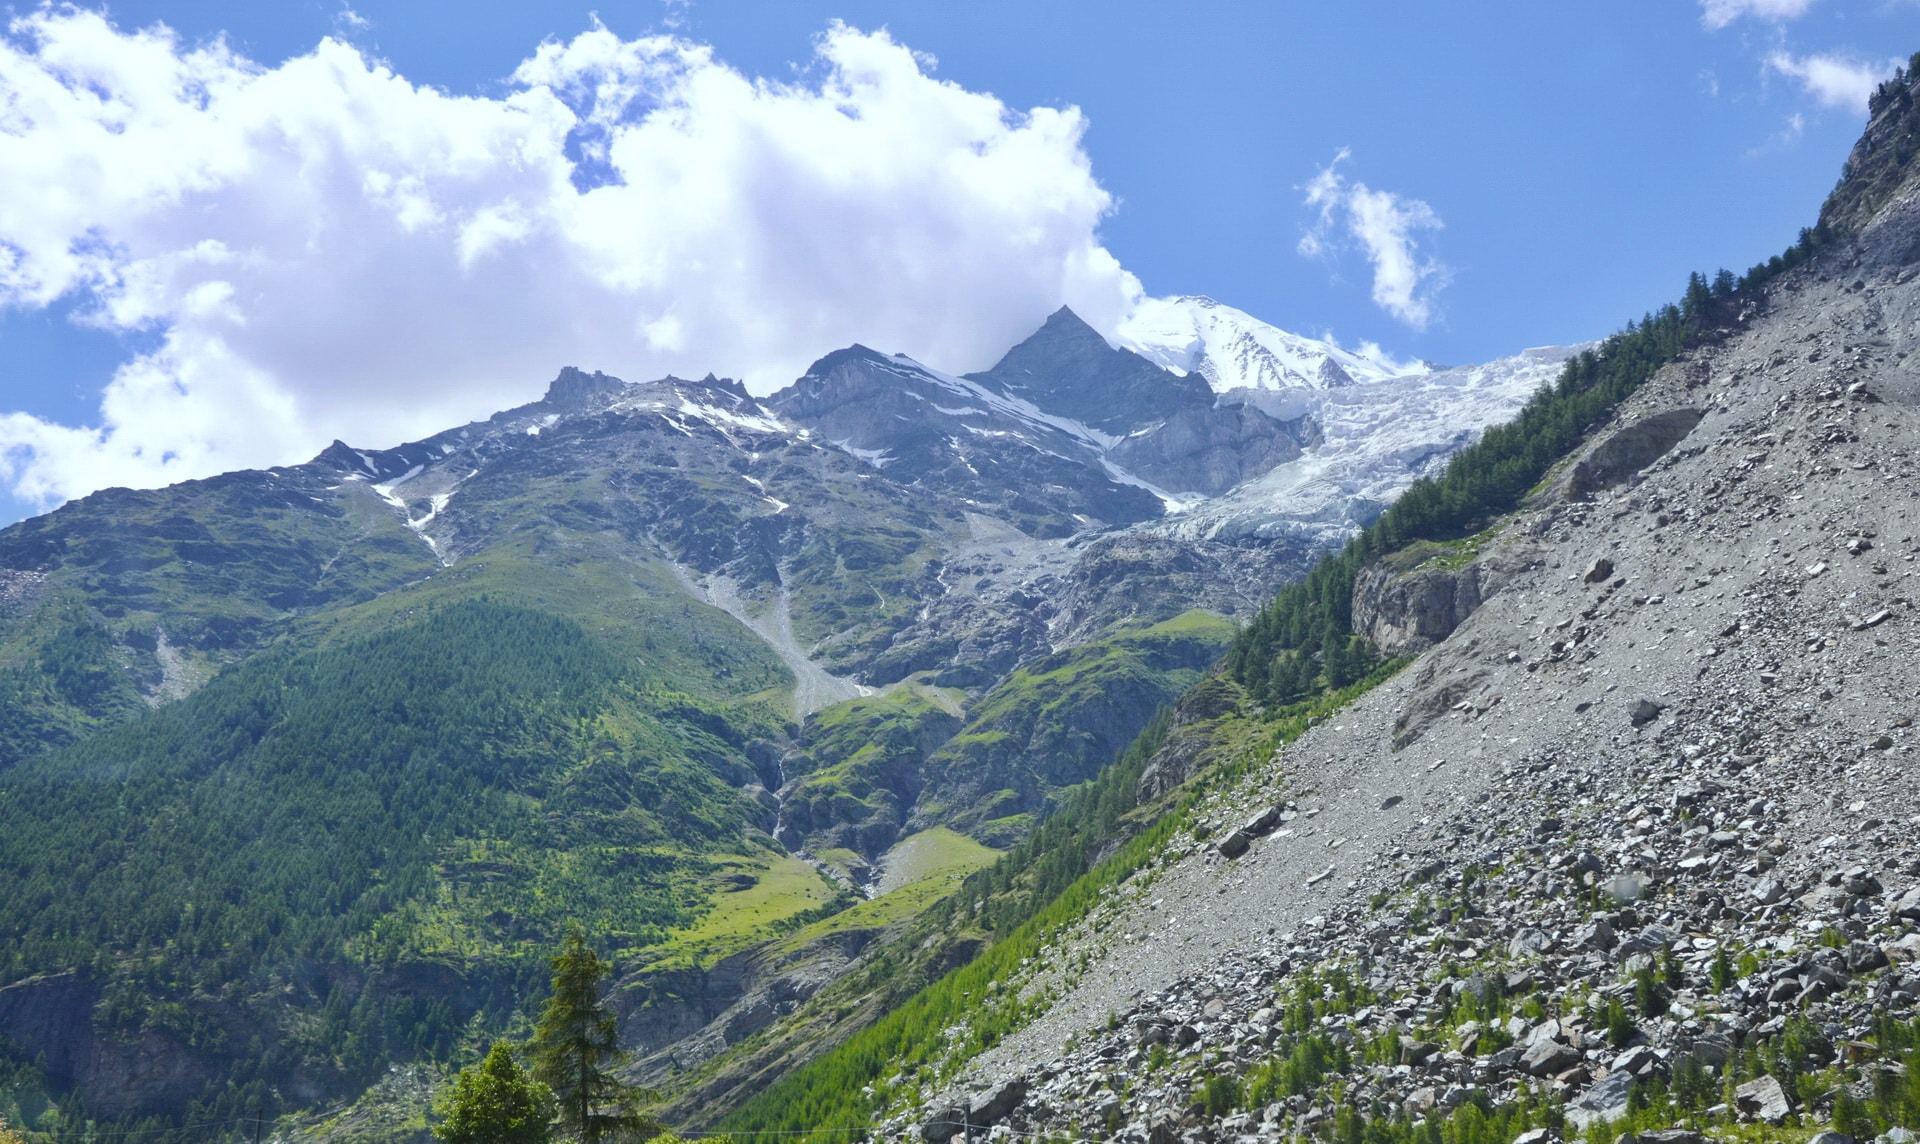 Zermatt is surrounded by high mountain peaks